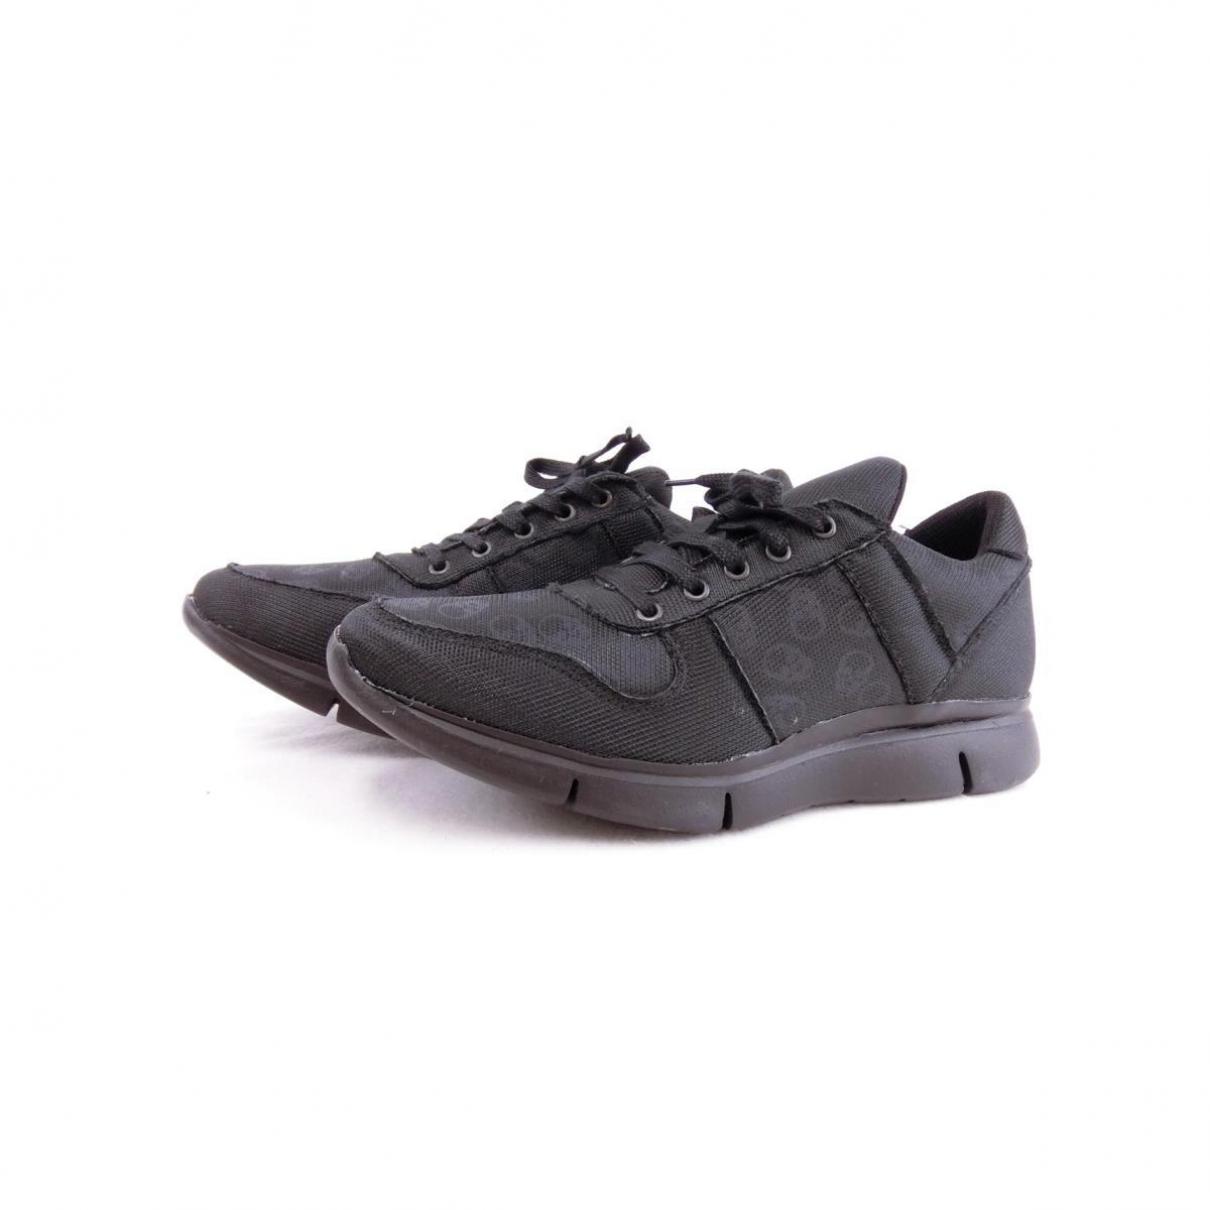 Lucien Pellat Finet \N Sneakers in  Schwarz Leder